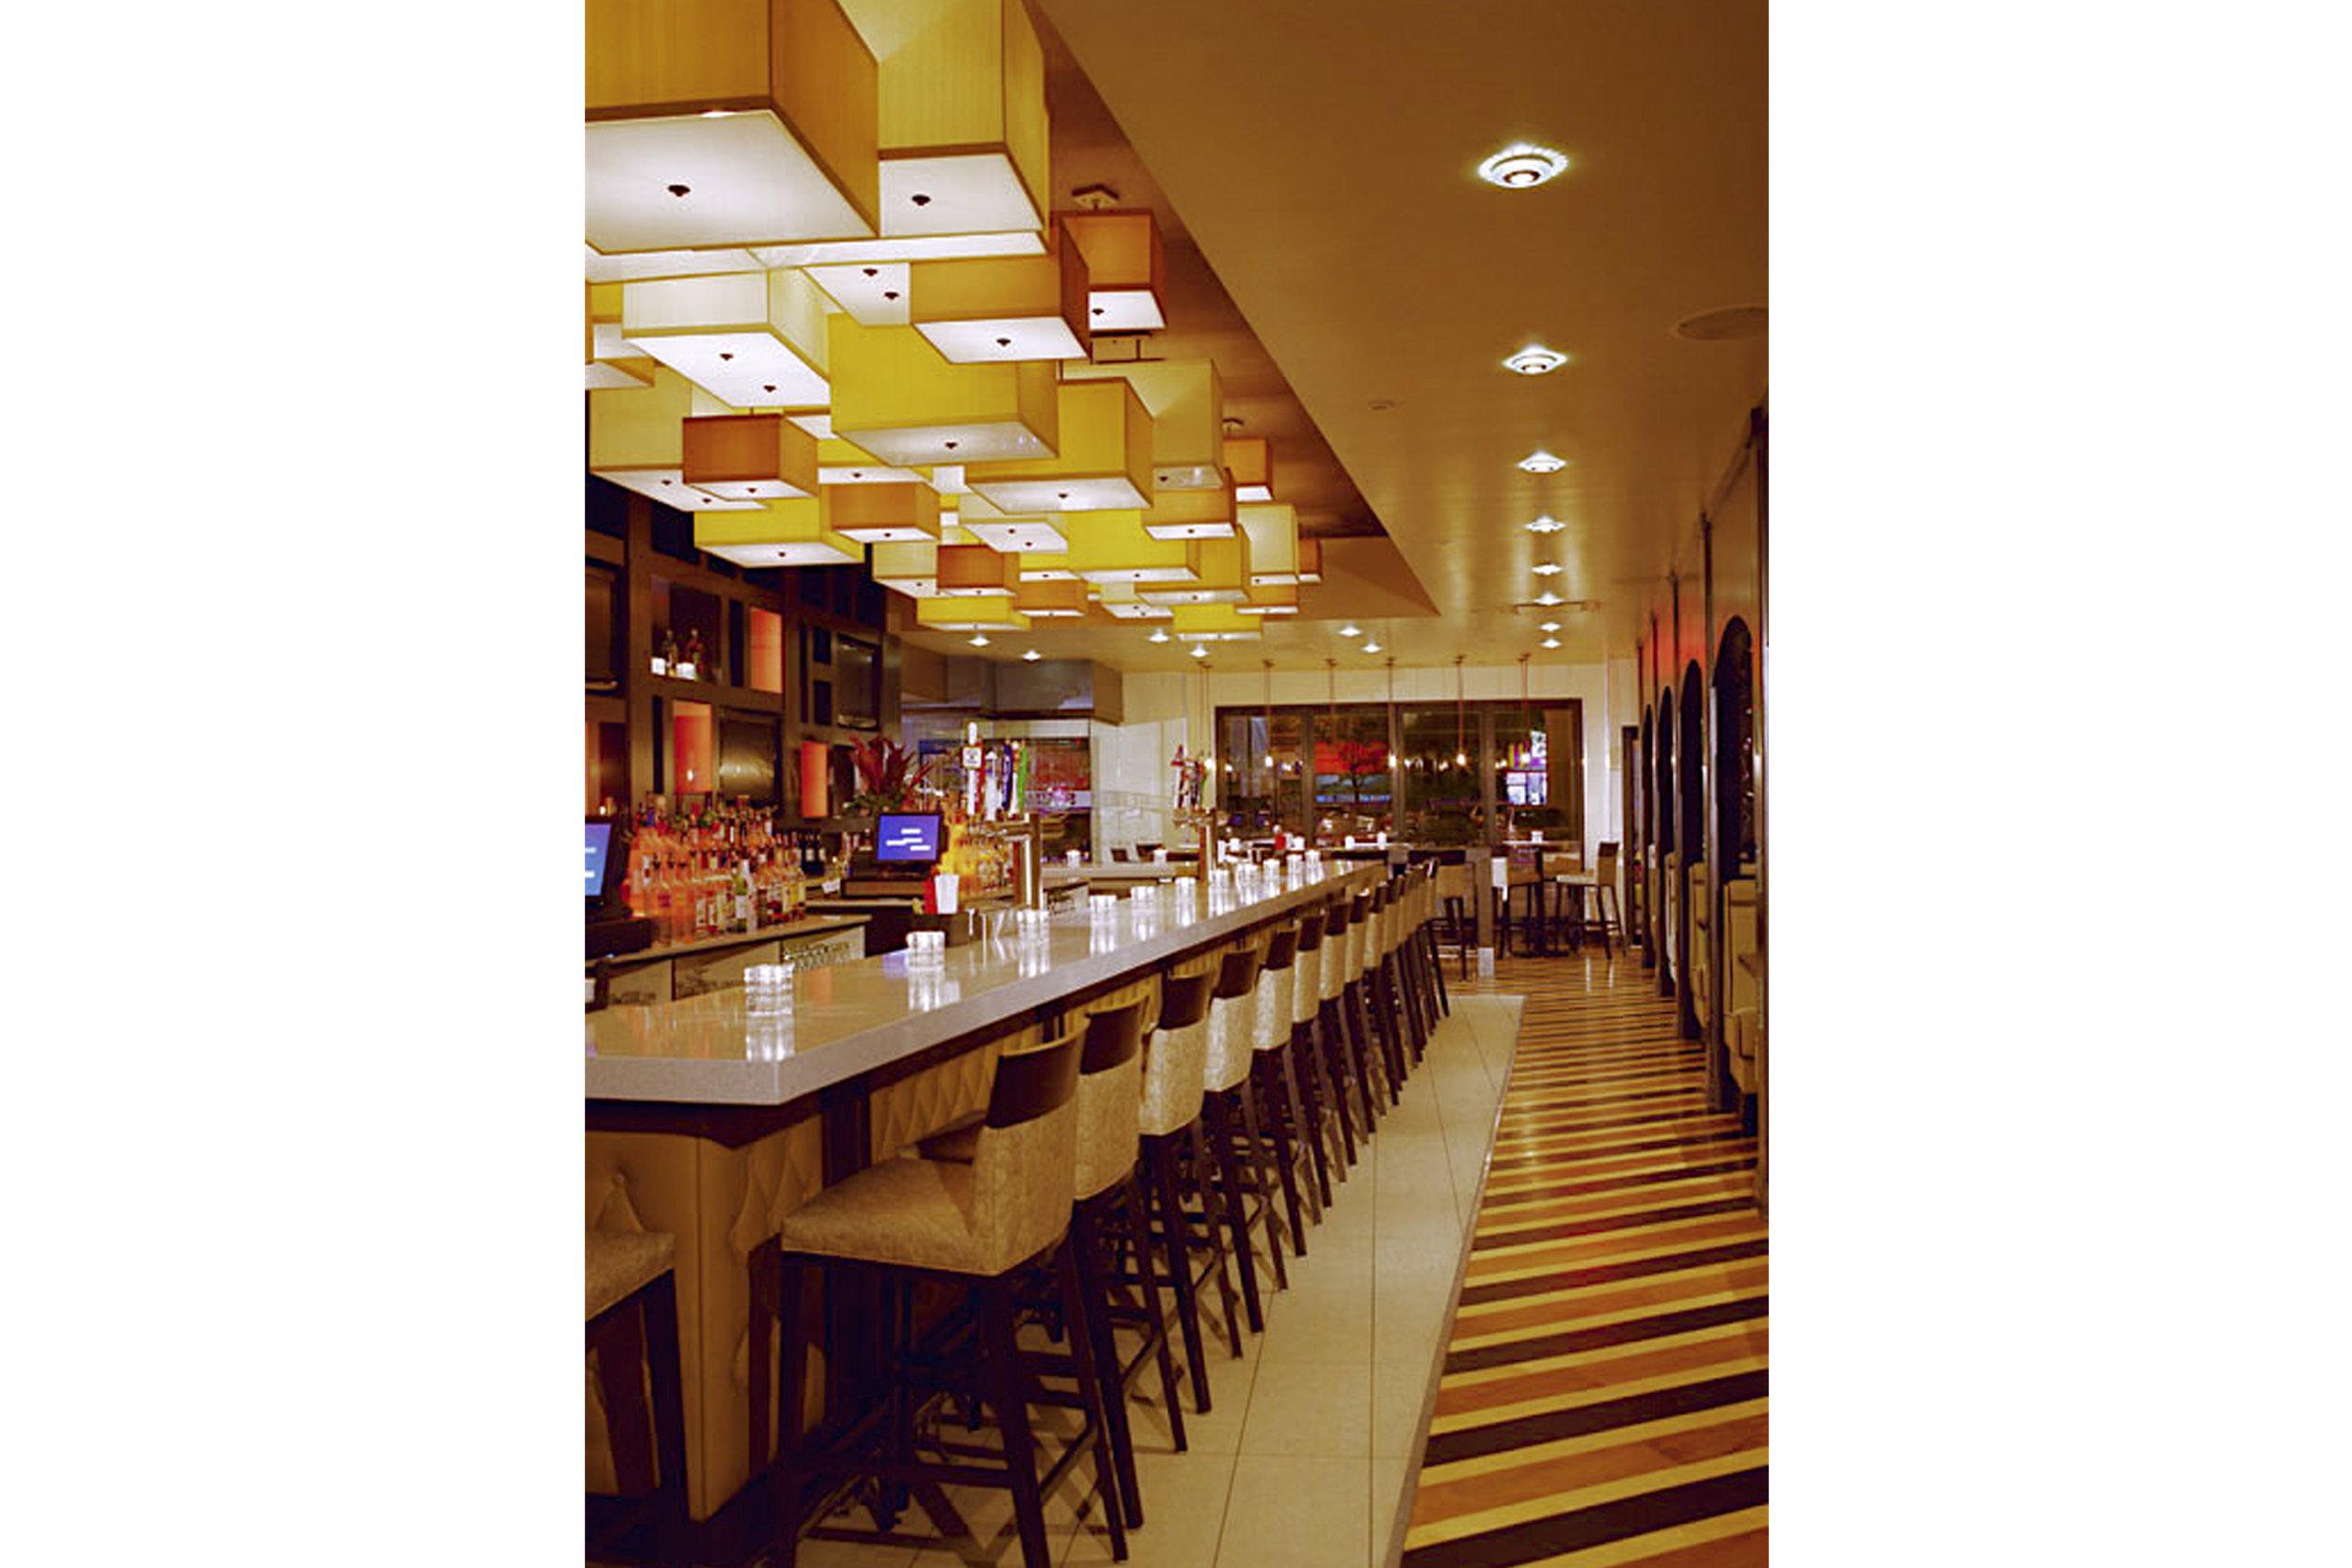 Sidetracks Restaurant & Bar - Sunnyside, NY